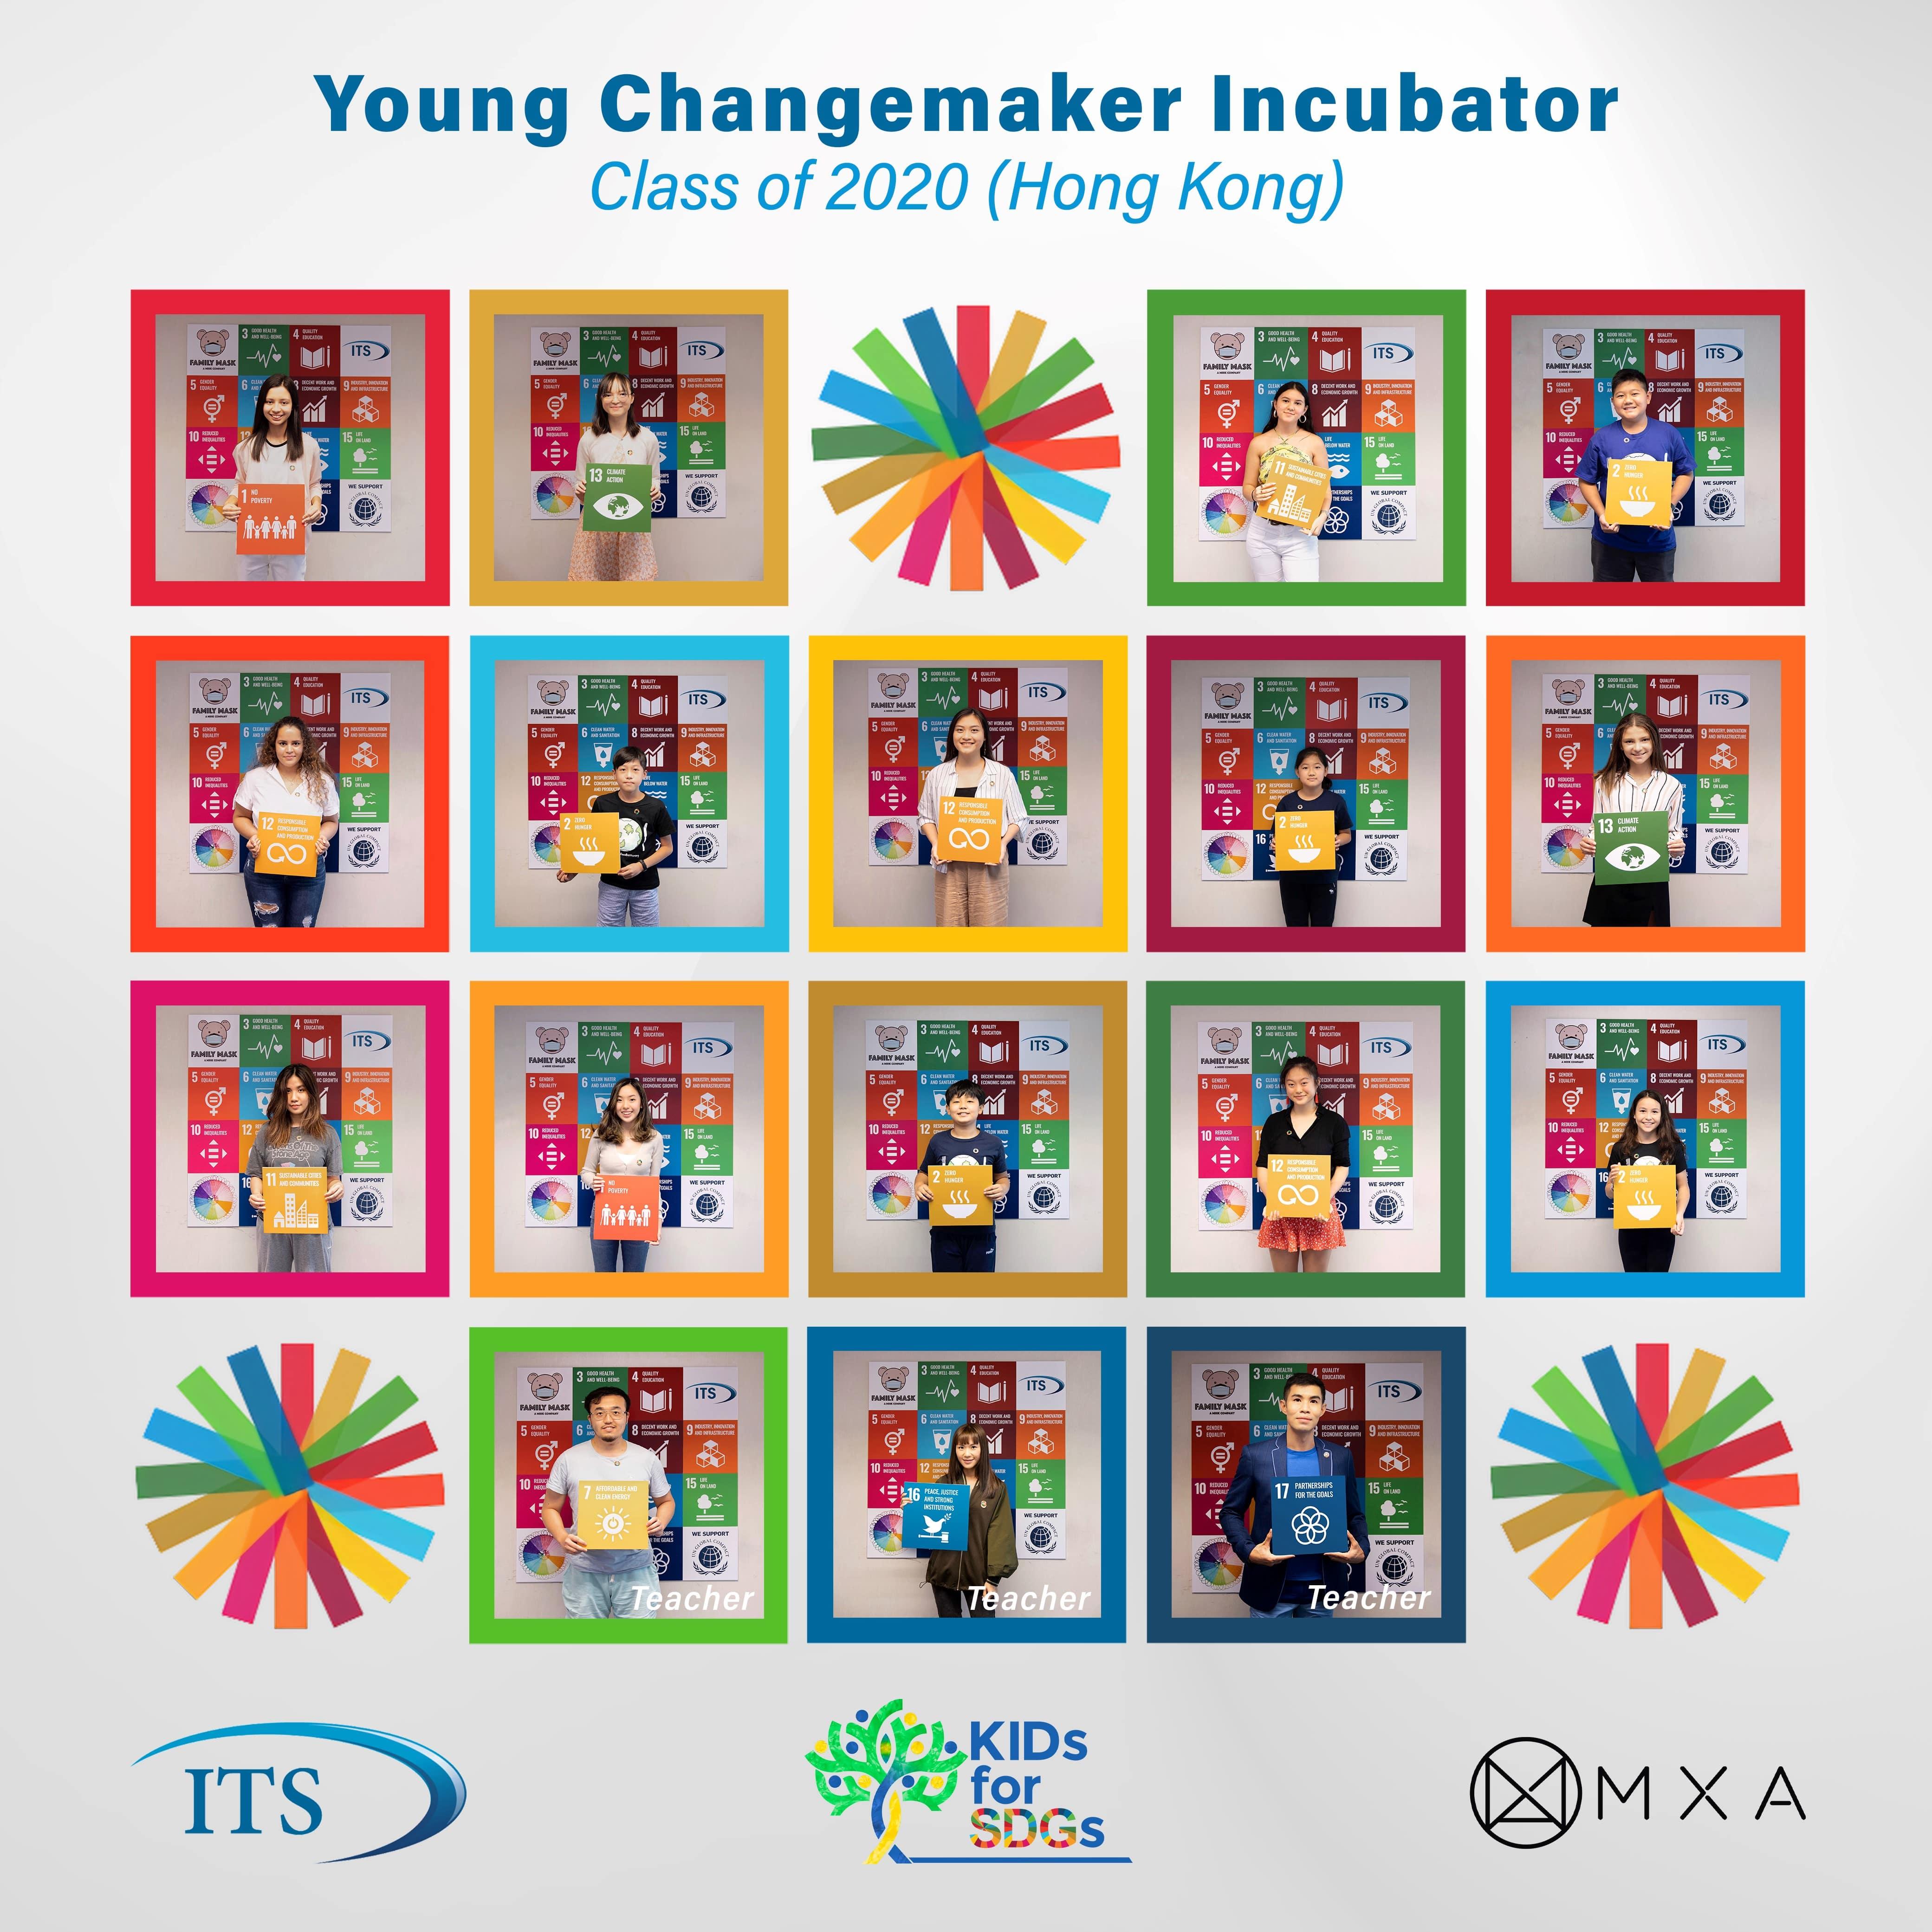 YCI kids for SDGs